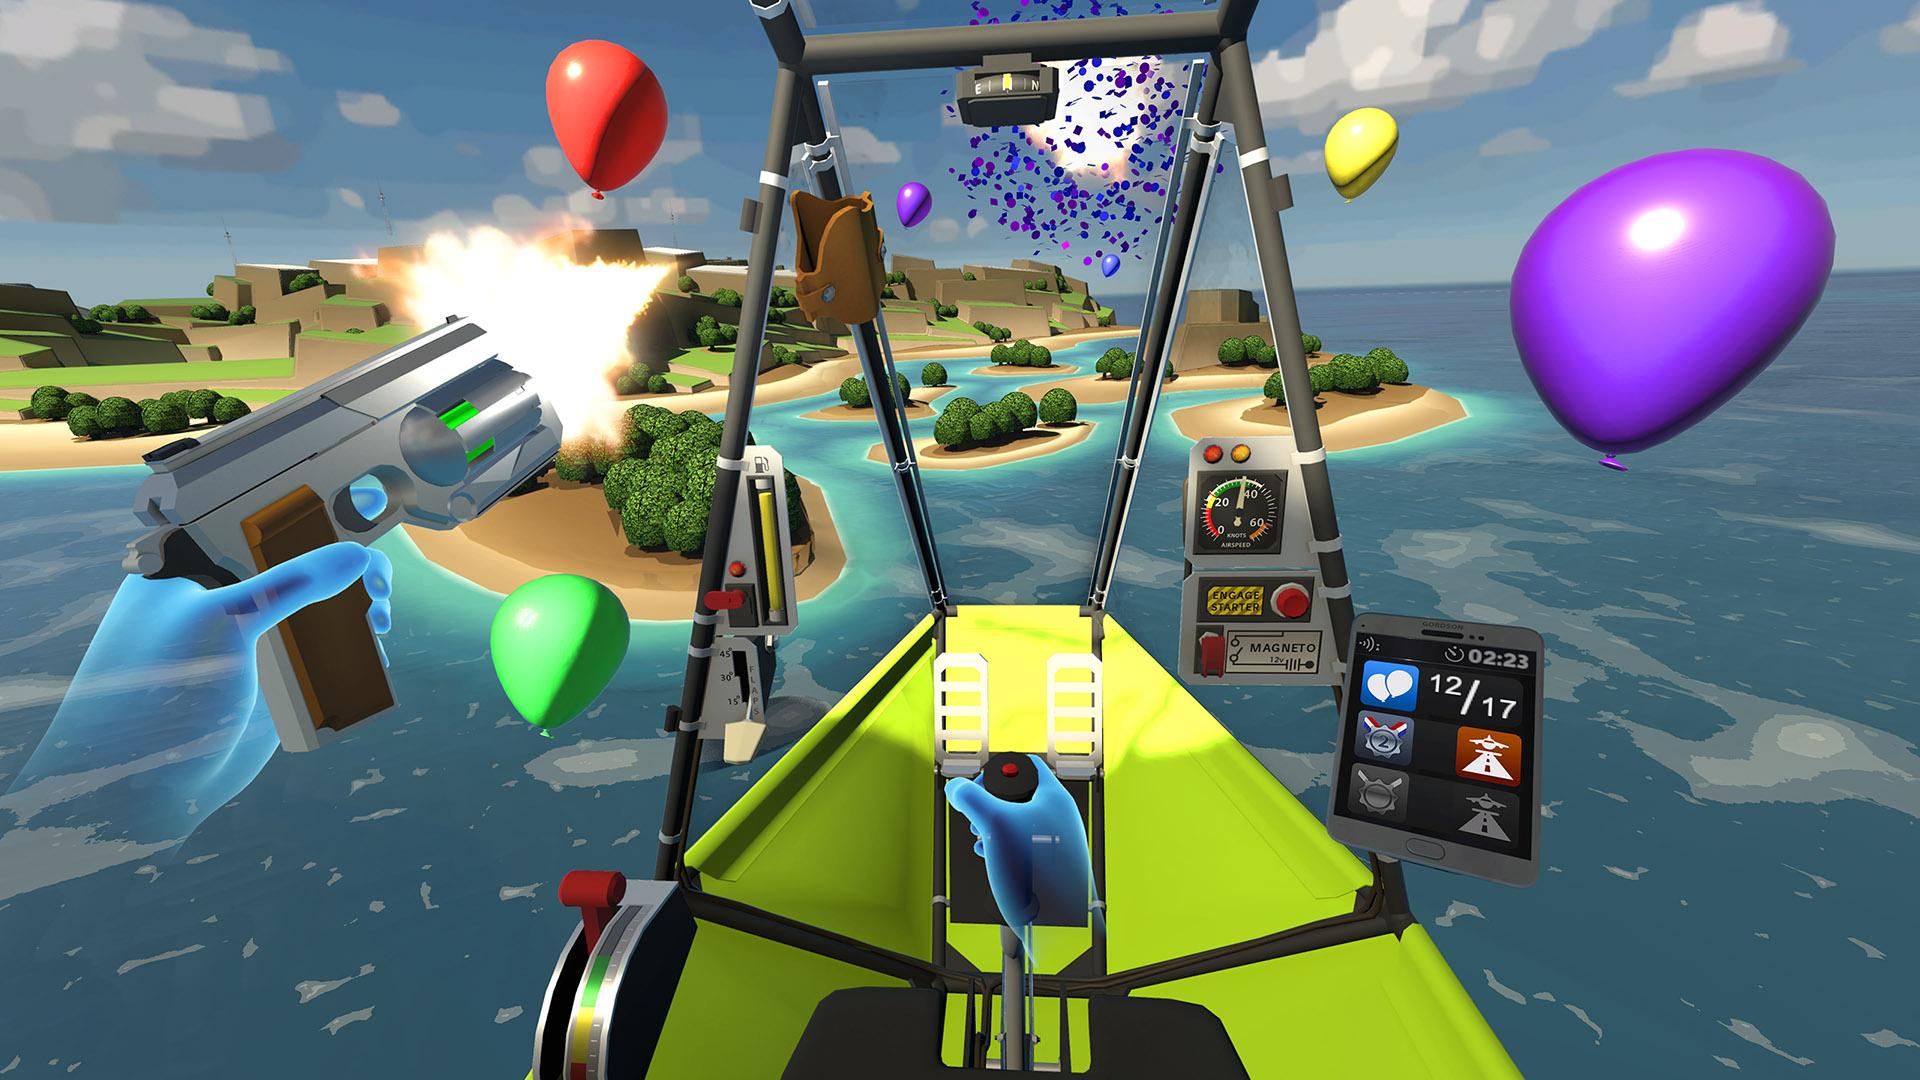 Ultrawings-PlayStation-VR-PSVR